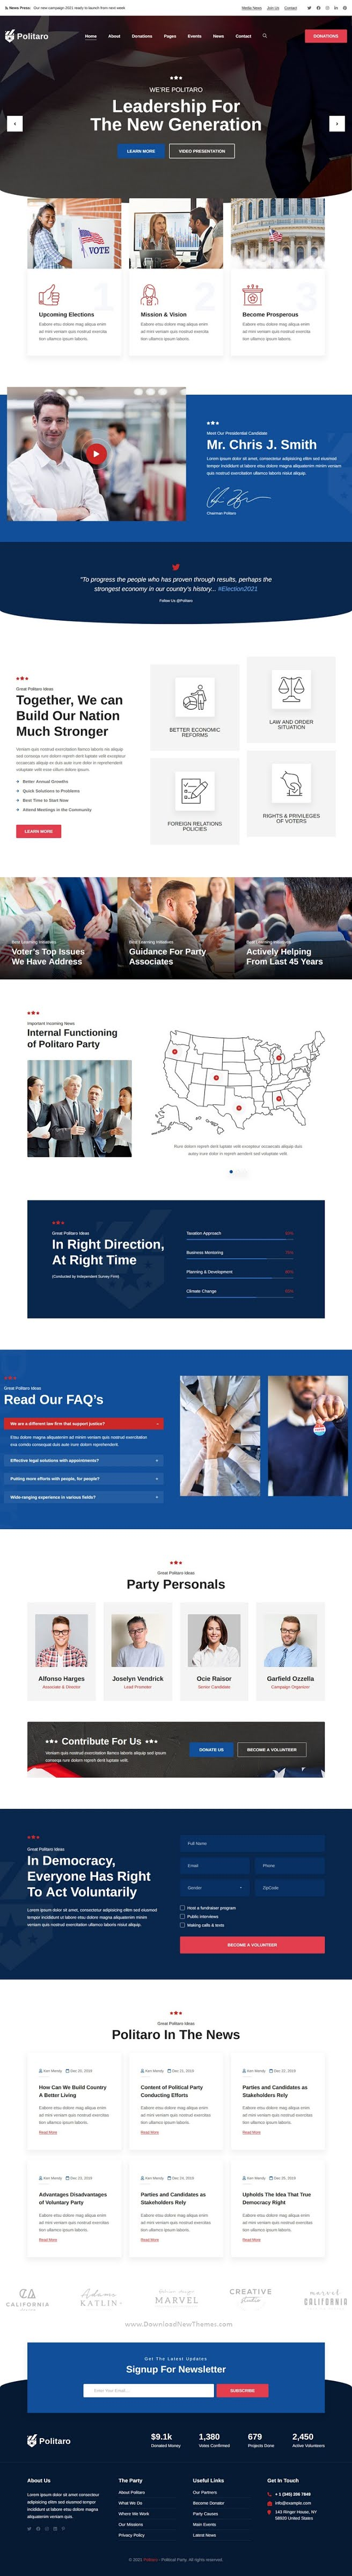 Politaro Political and Government HTML Template